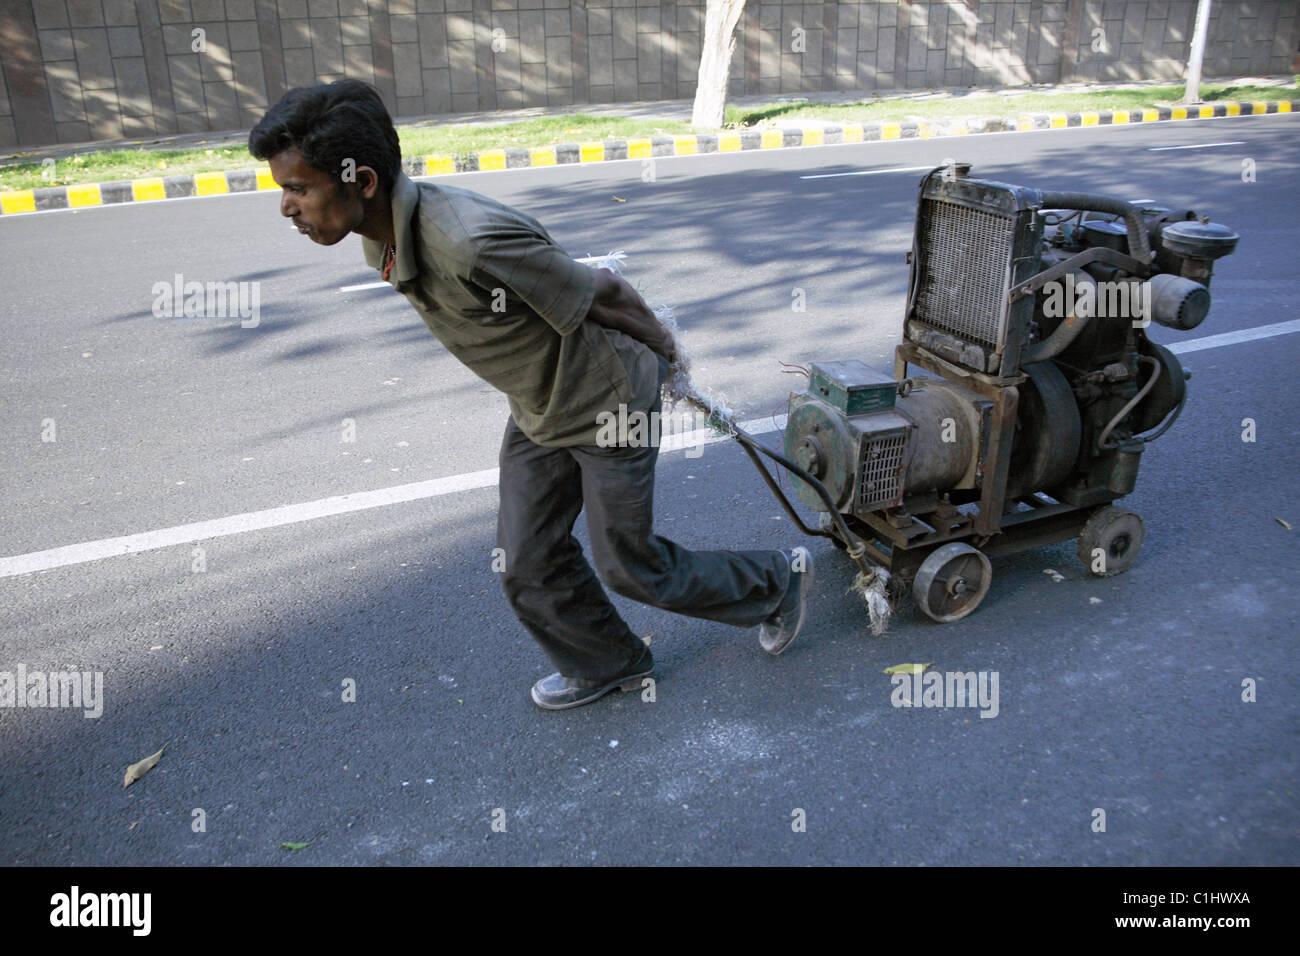 IND, l'Inde, 20110310, travailleur Photo Stock